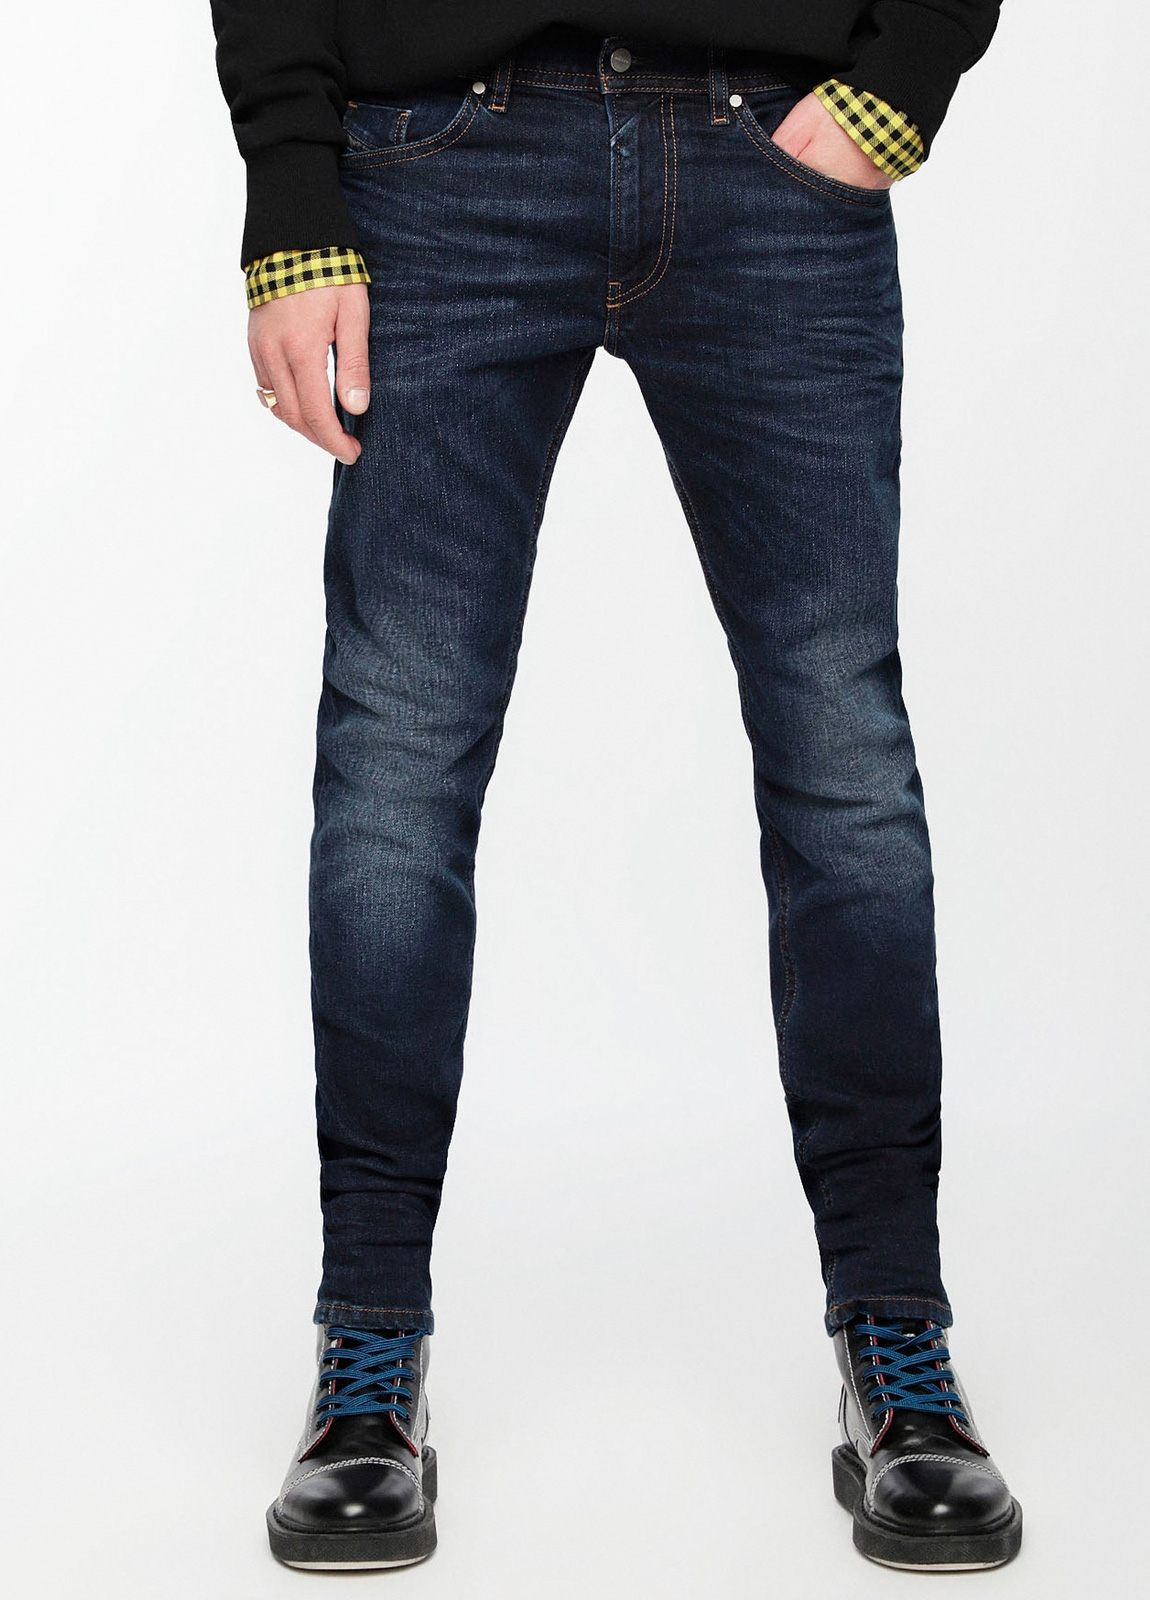 Pantalón tejano skinny modelo THOMMER color azul oscuro lavado. 98% Algodón, 2% Elastáno.